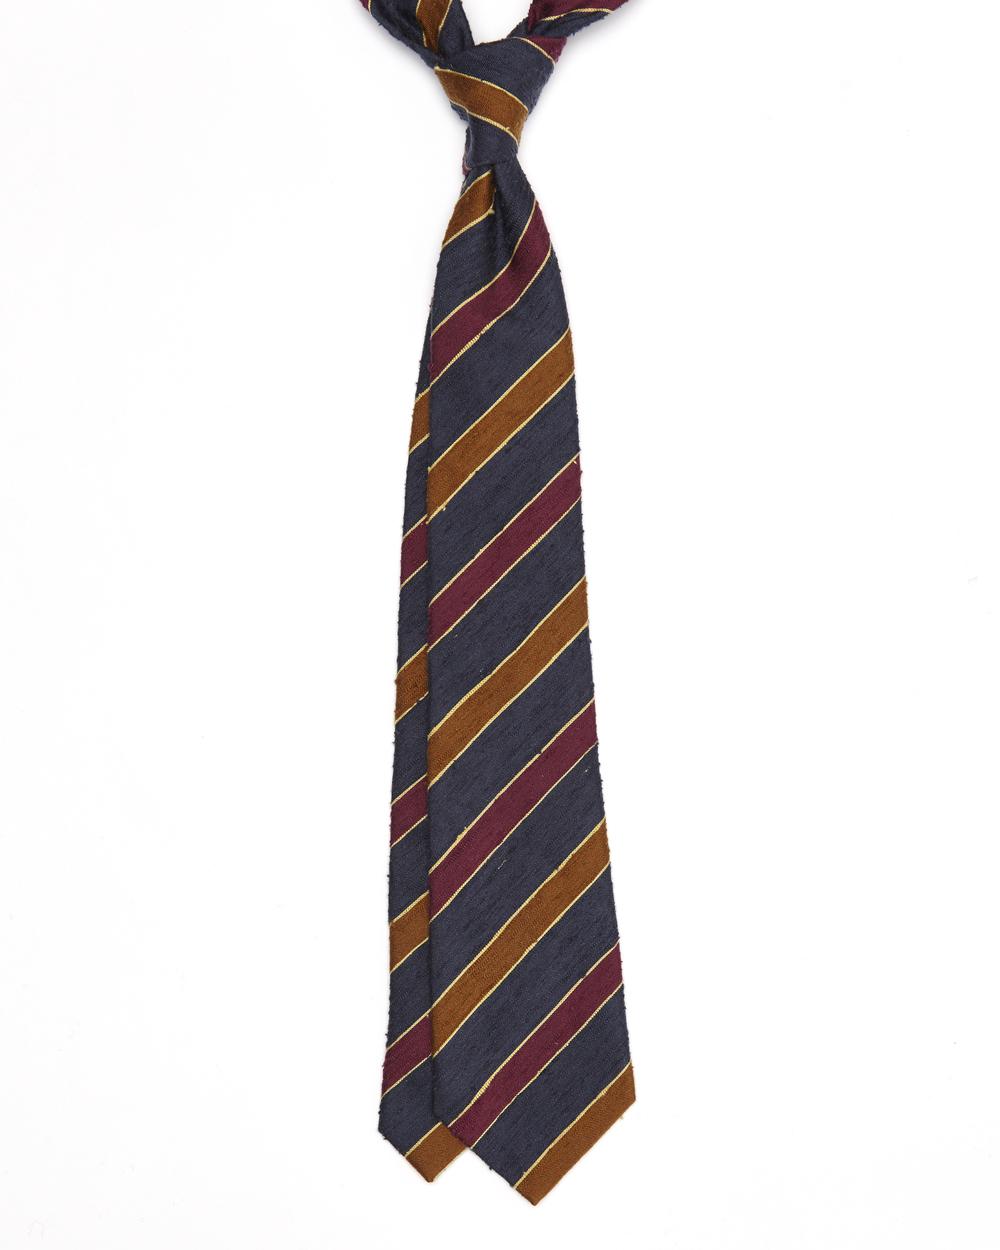 Leonard Tie |100% Buratti Silk Stripe | Colour: Navy, Burgundy & Light Yellow